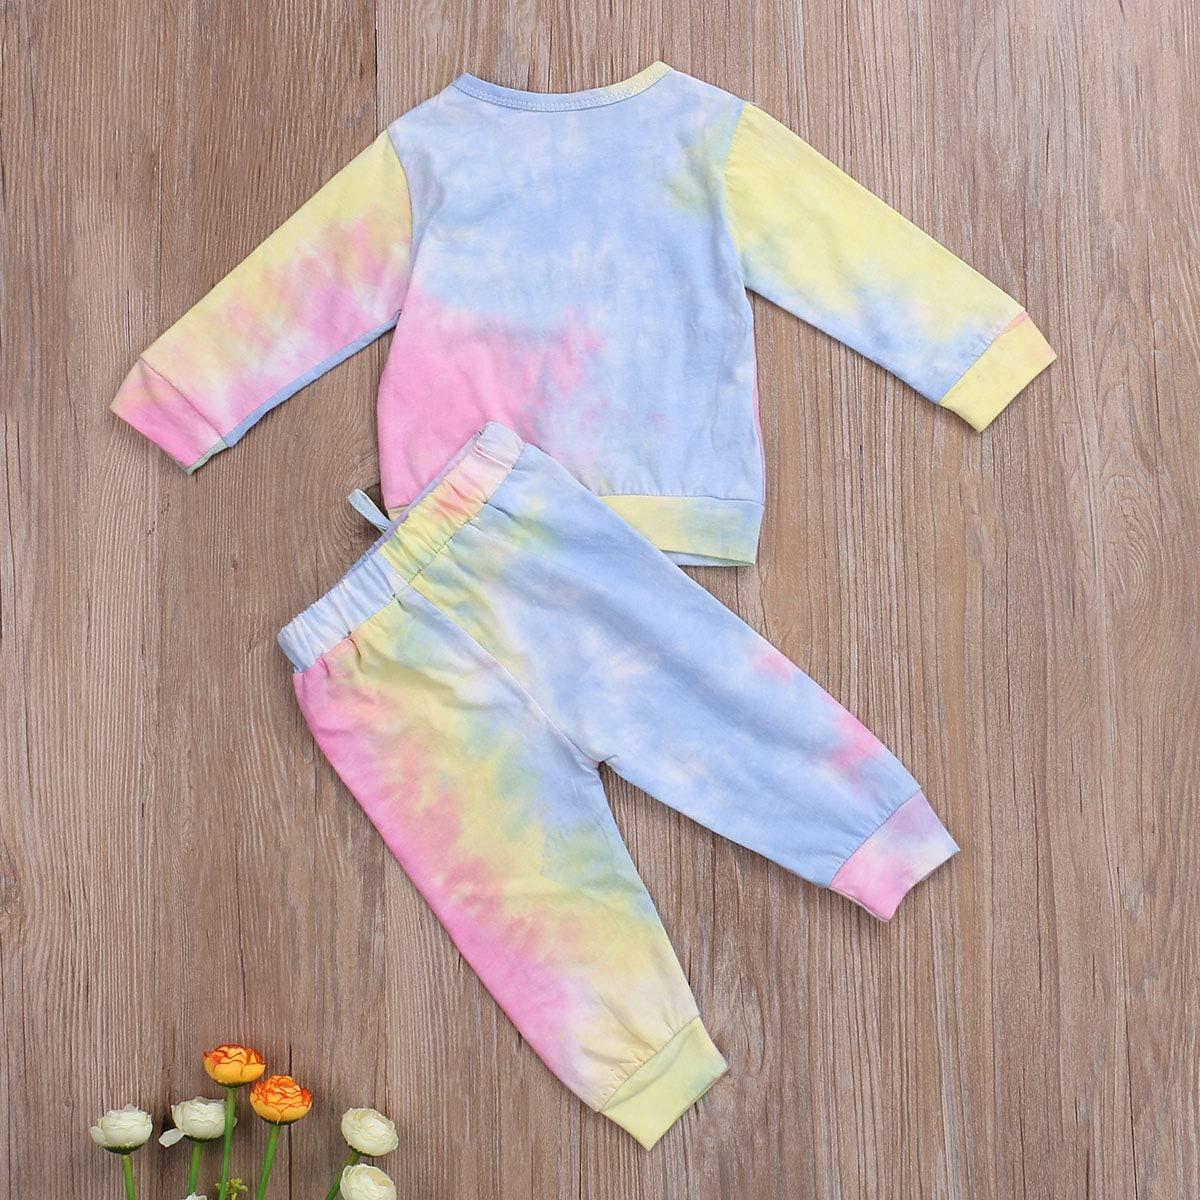 Toddler Kids Unisex Little Girls Boys Clothes Tie Dye Pajama Set Snug-fit Sleepwear Lounge Wear Fall Outfit